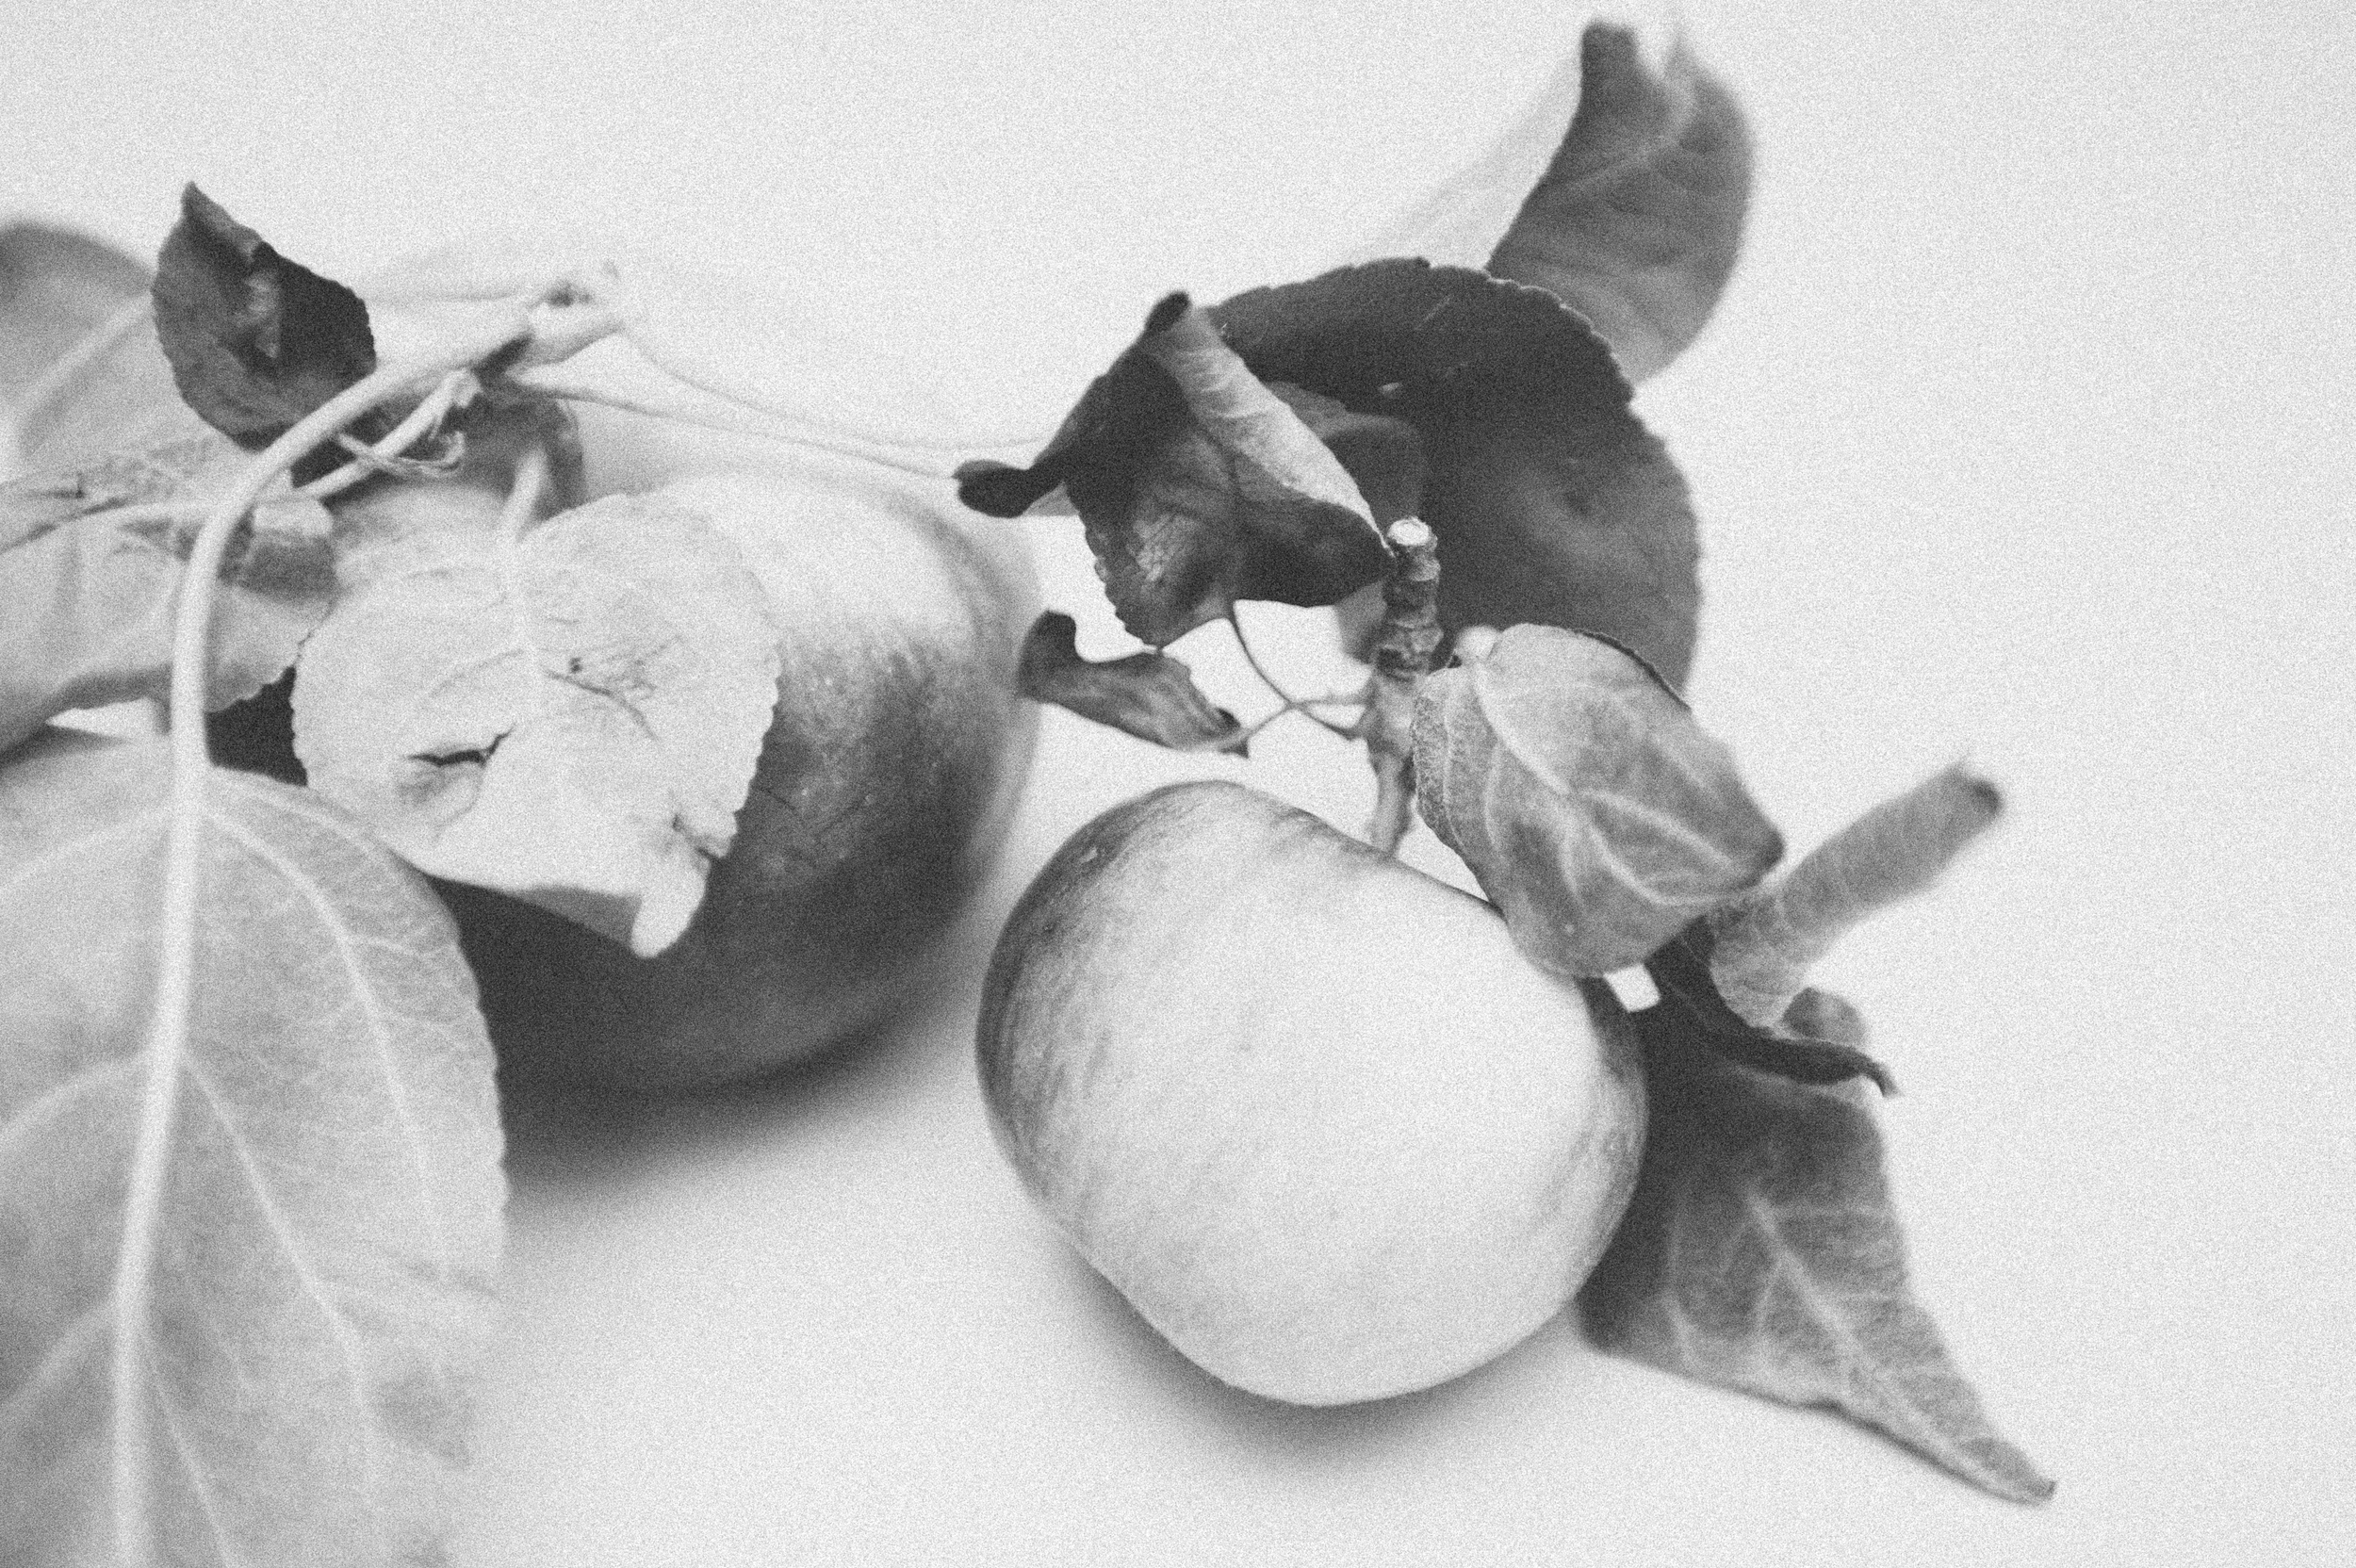 foodstyling + imagery by ashley updyke photography